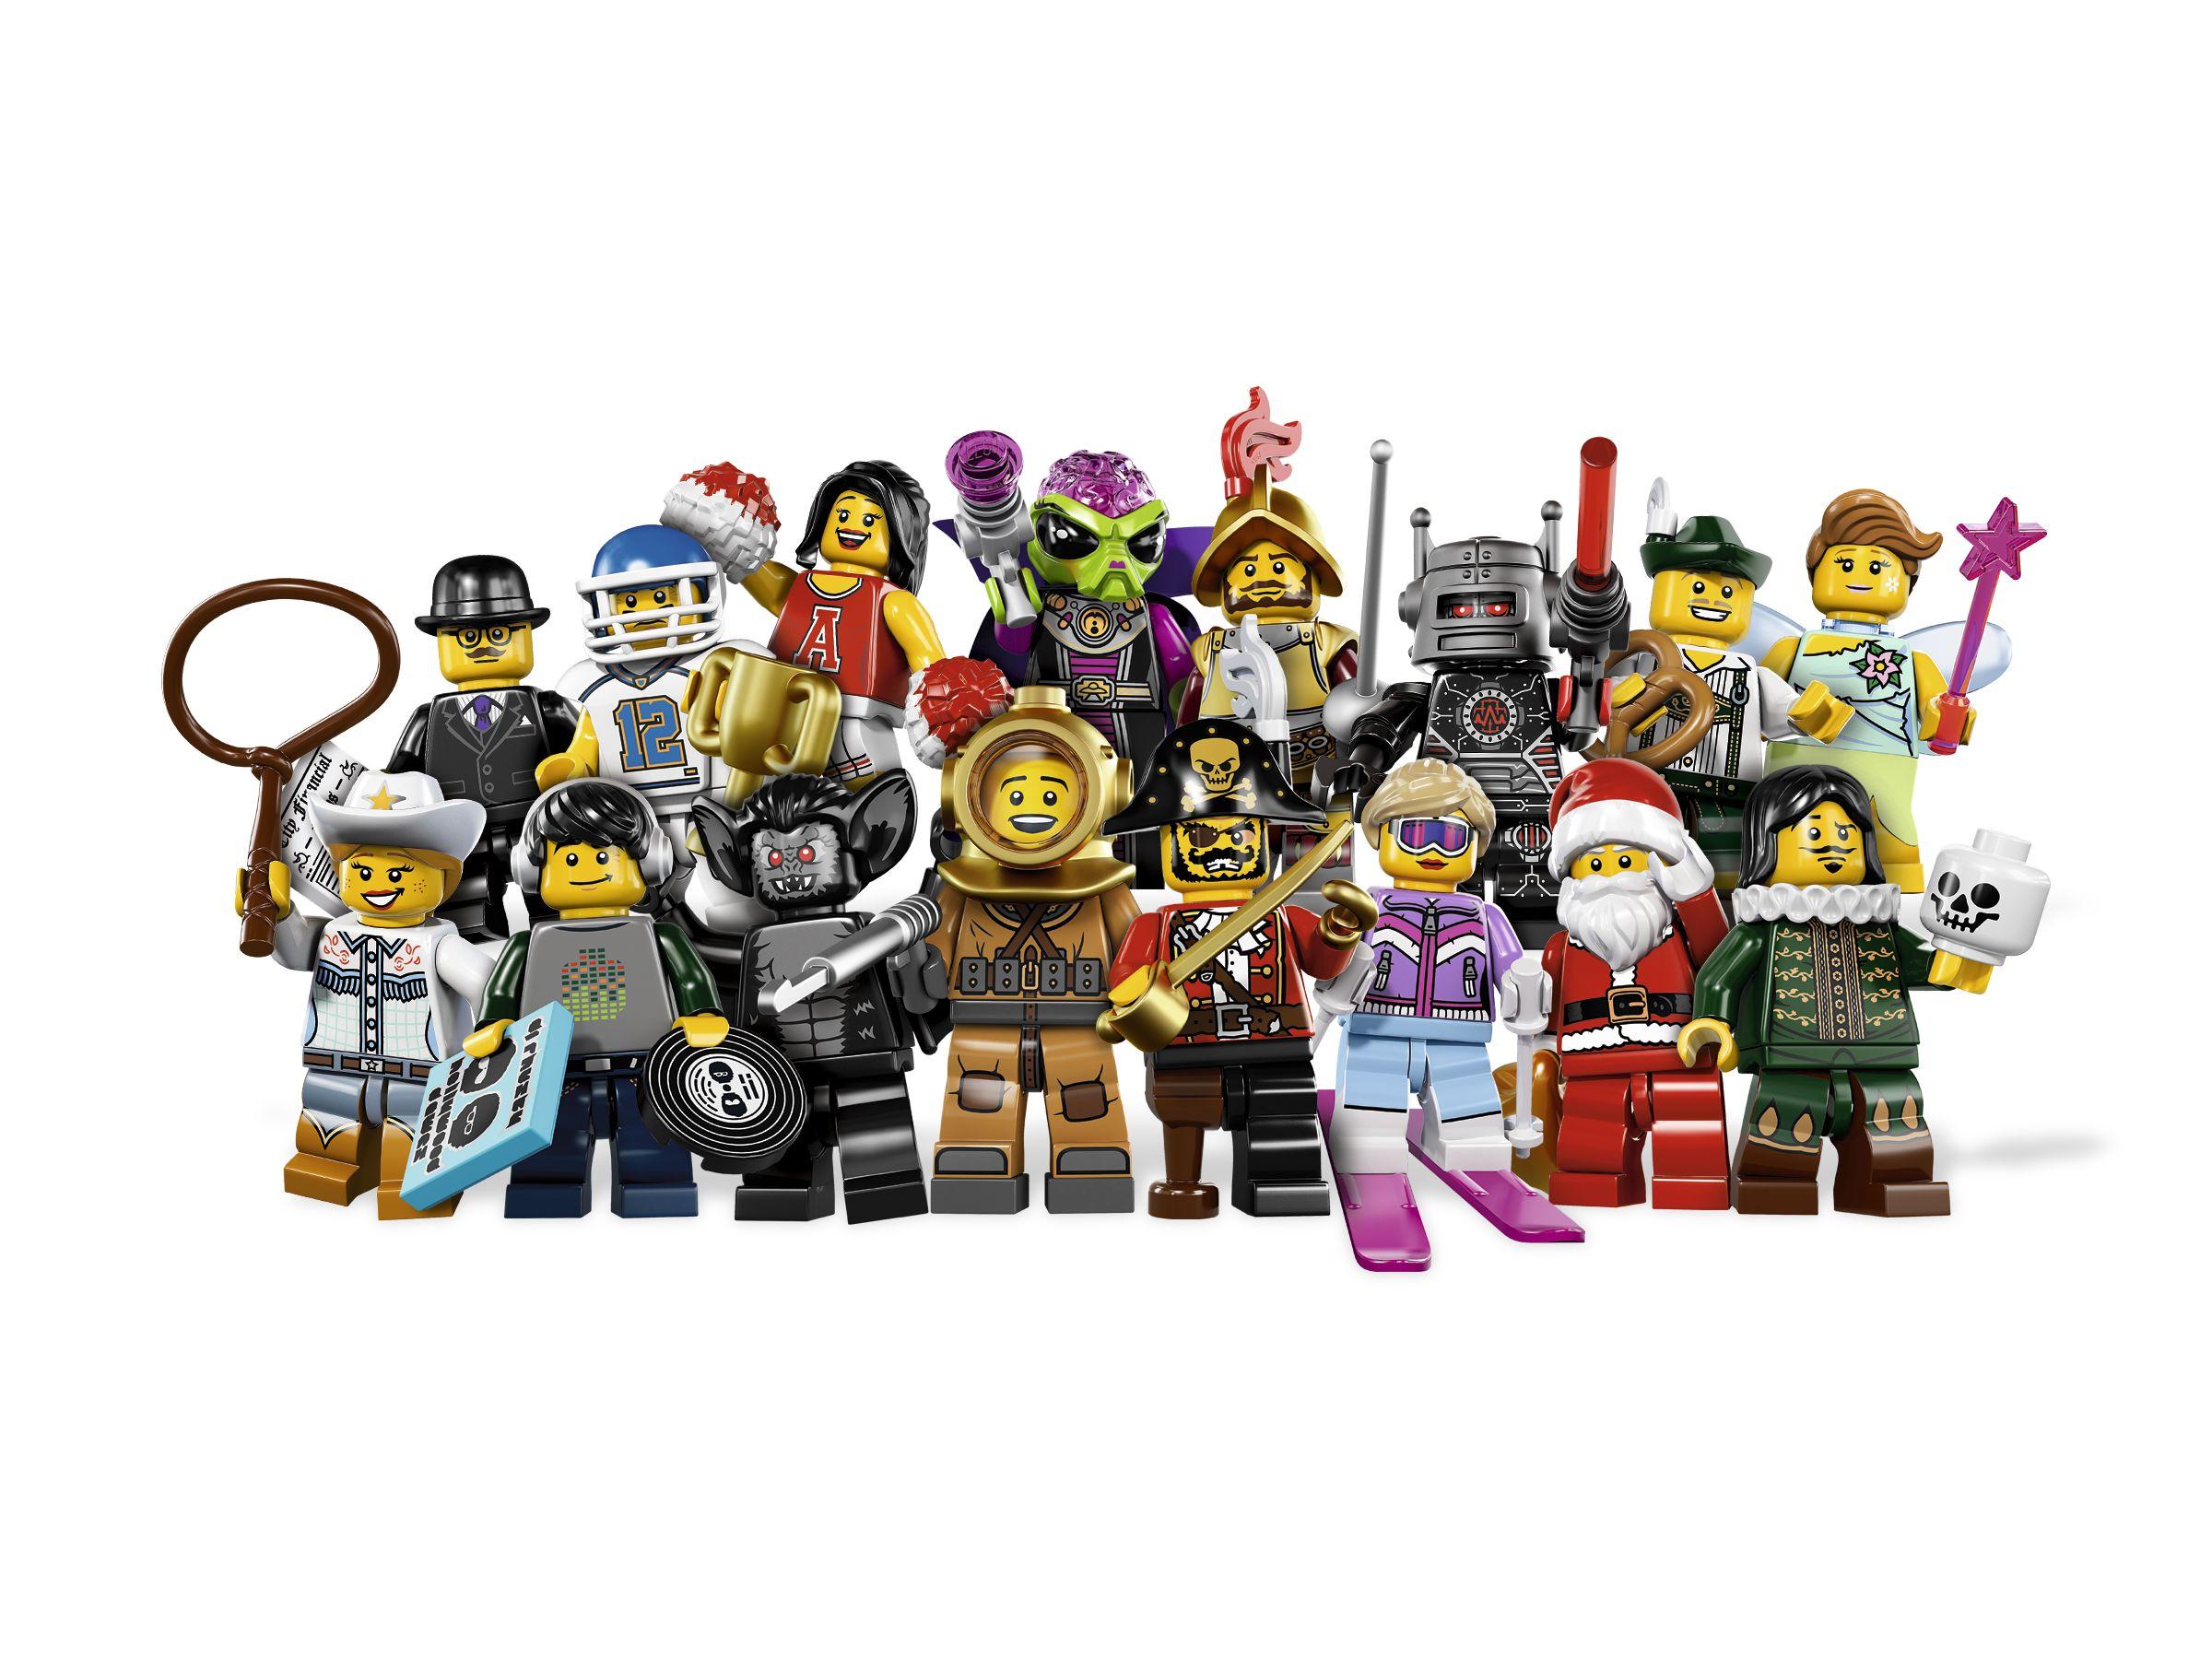 2013年01月 LEGO人仔 Series 9 - LEGO積木 - Toysdaily 玩具日報 - Powered by Discuz!